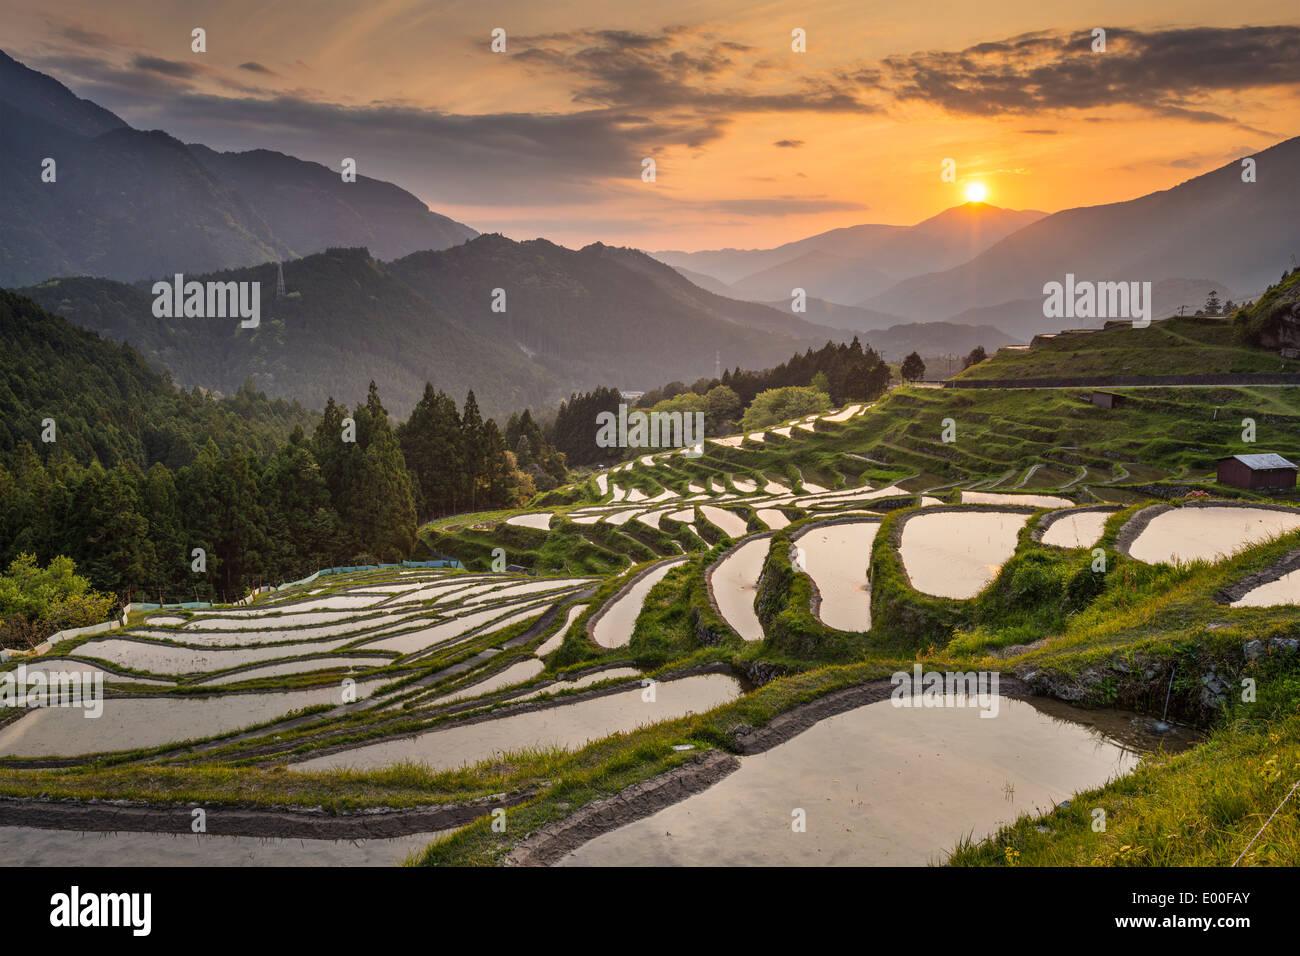 Japanese rice terraces at sunset. Maruyama-senmaida, Kumano, Japan. - Stock Image